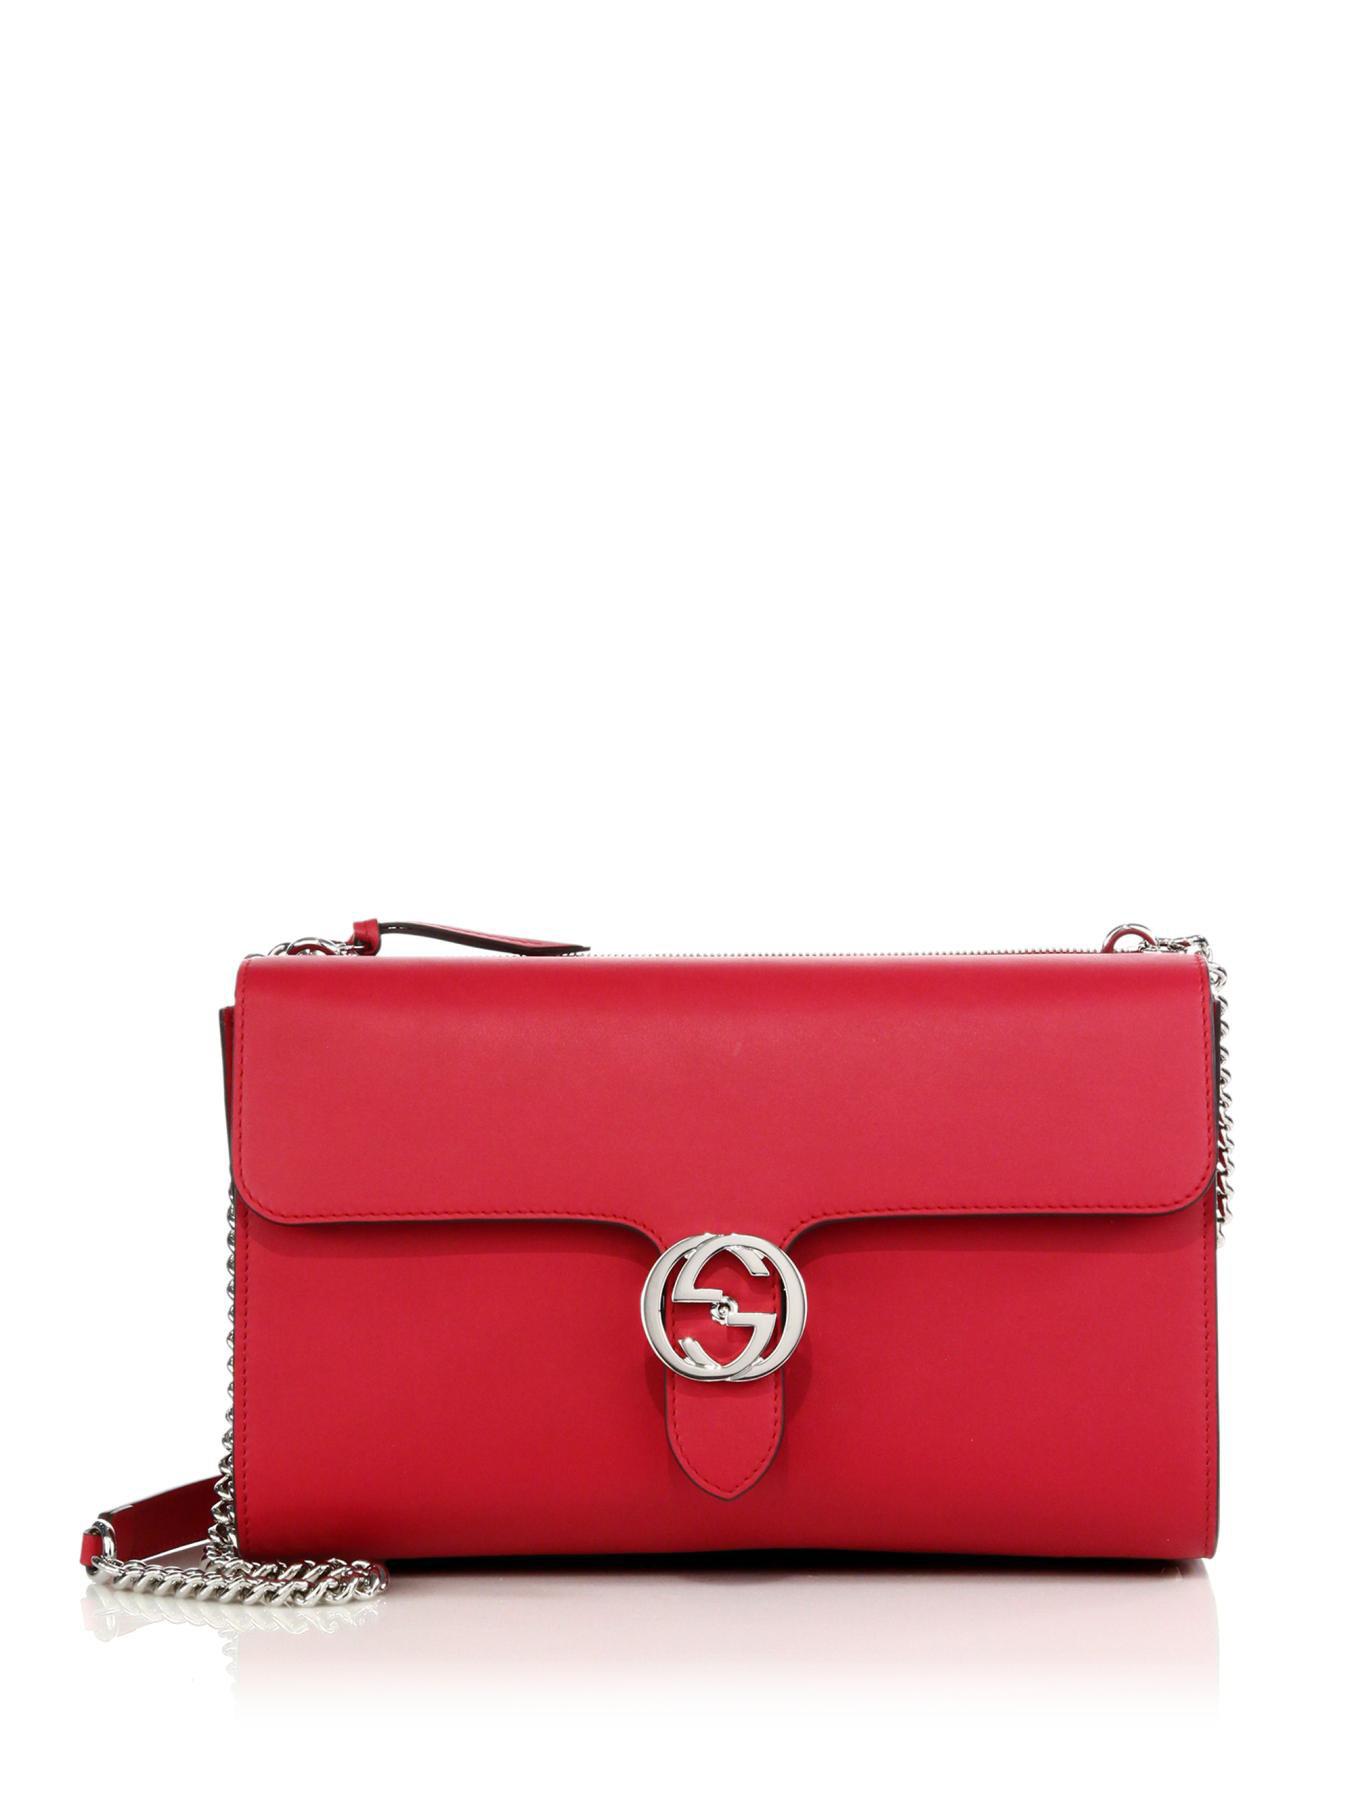 50652c7b88bf Gucci Interlocking Leather Shoulder Bag in Red - Lyst